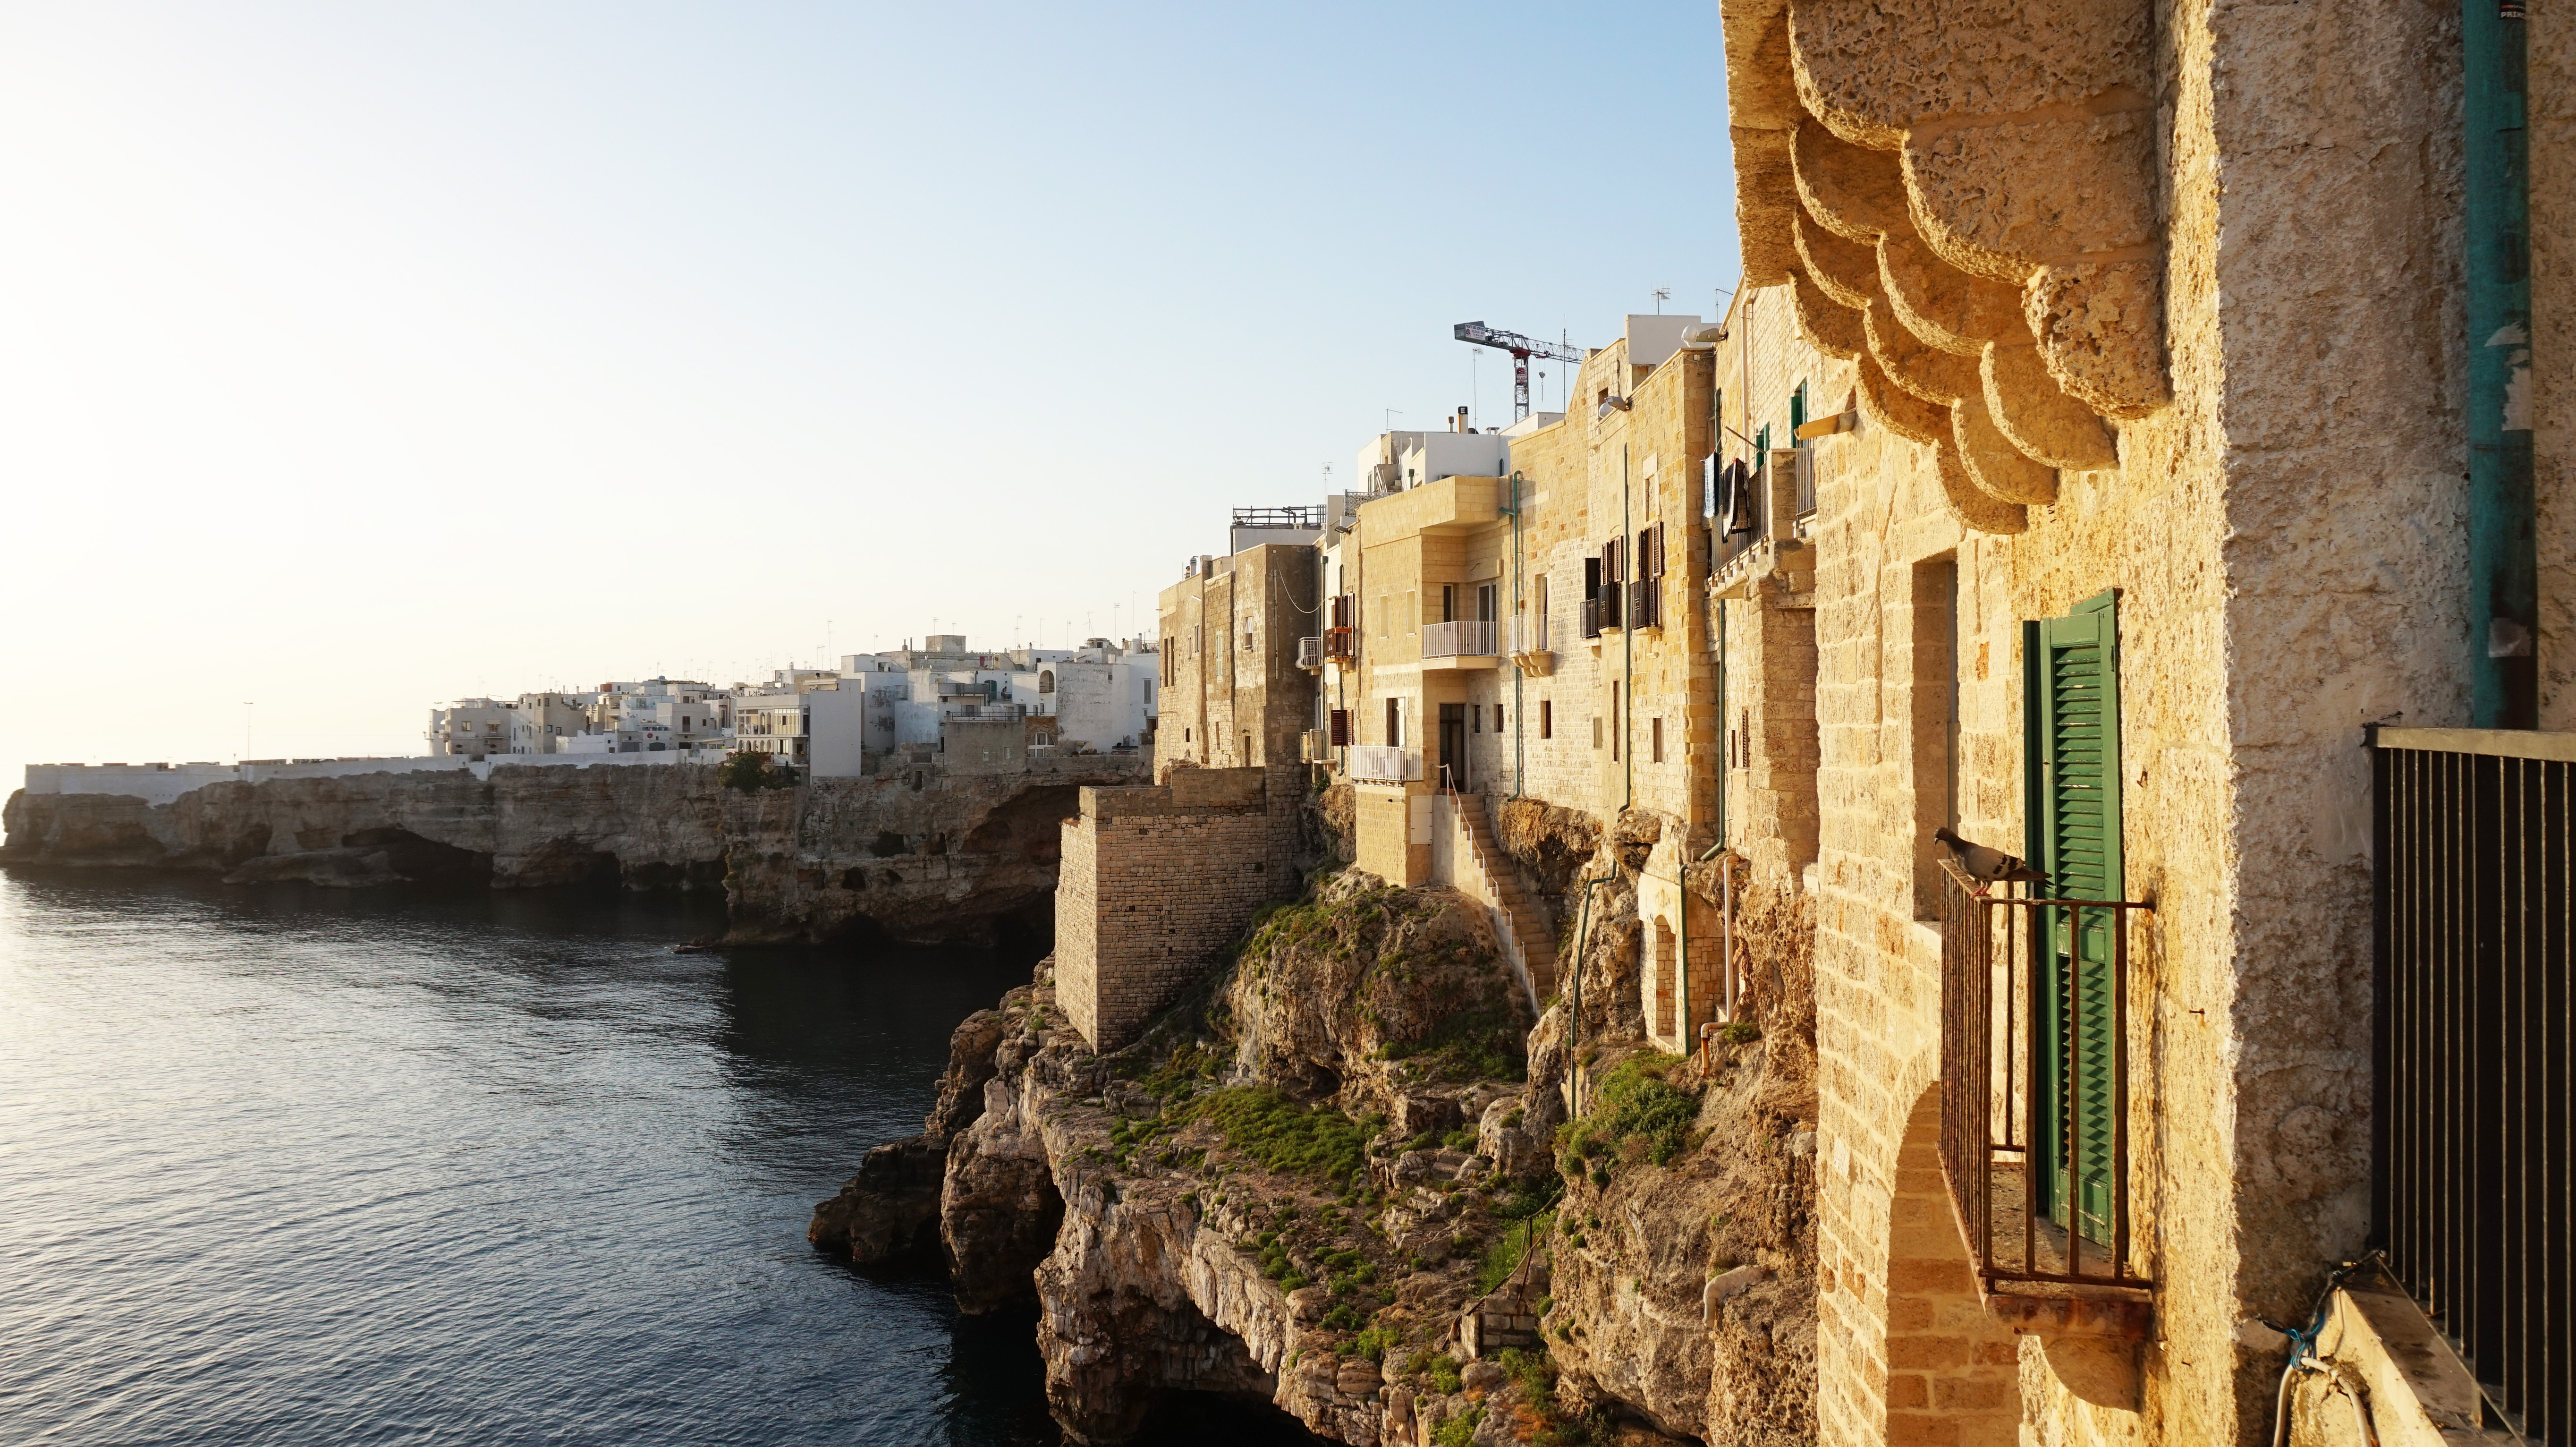 grotta palazzese   grotta palazzese hotel restaurant   italy   romance   romantic destinations   travel   vacation   destinations